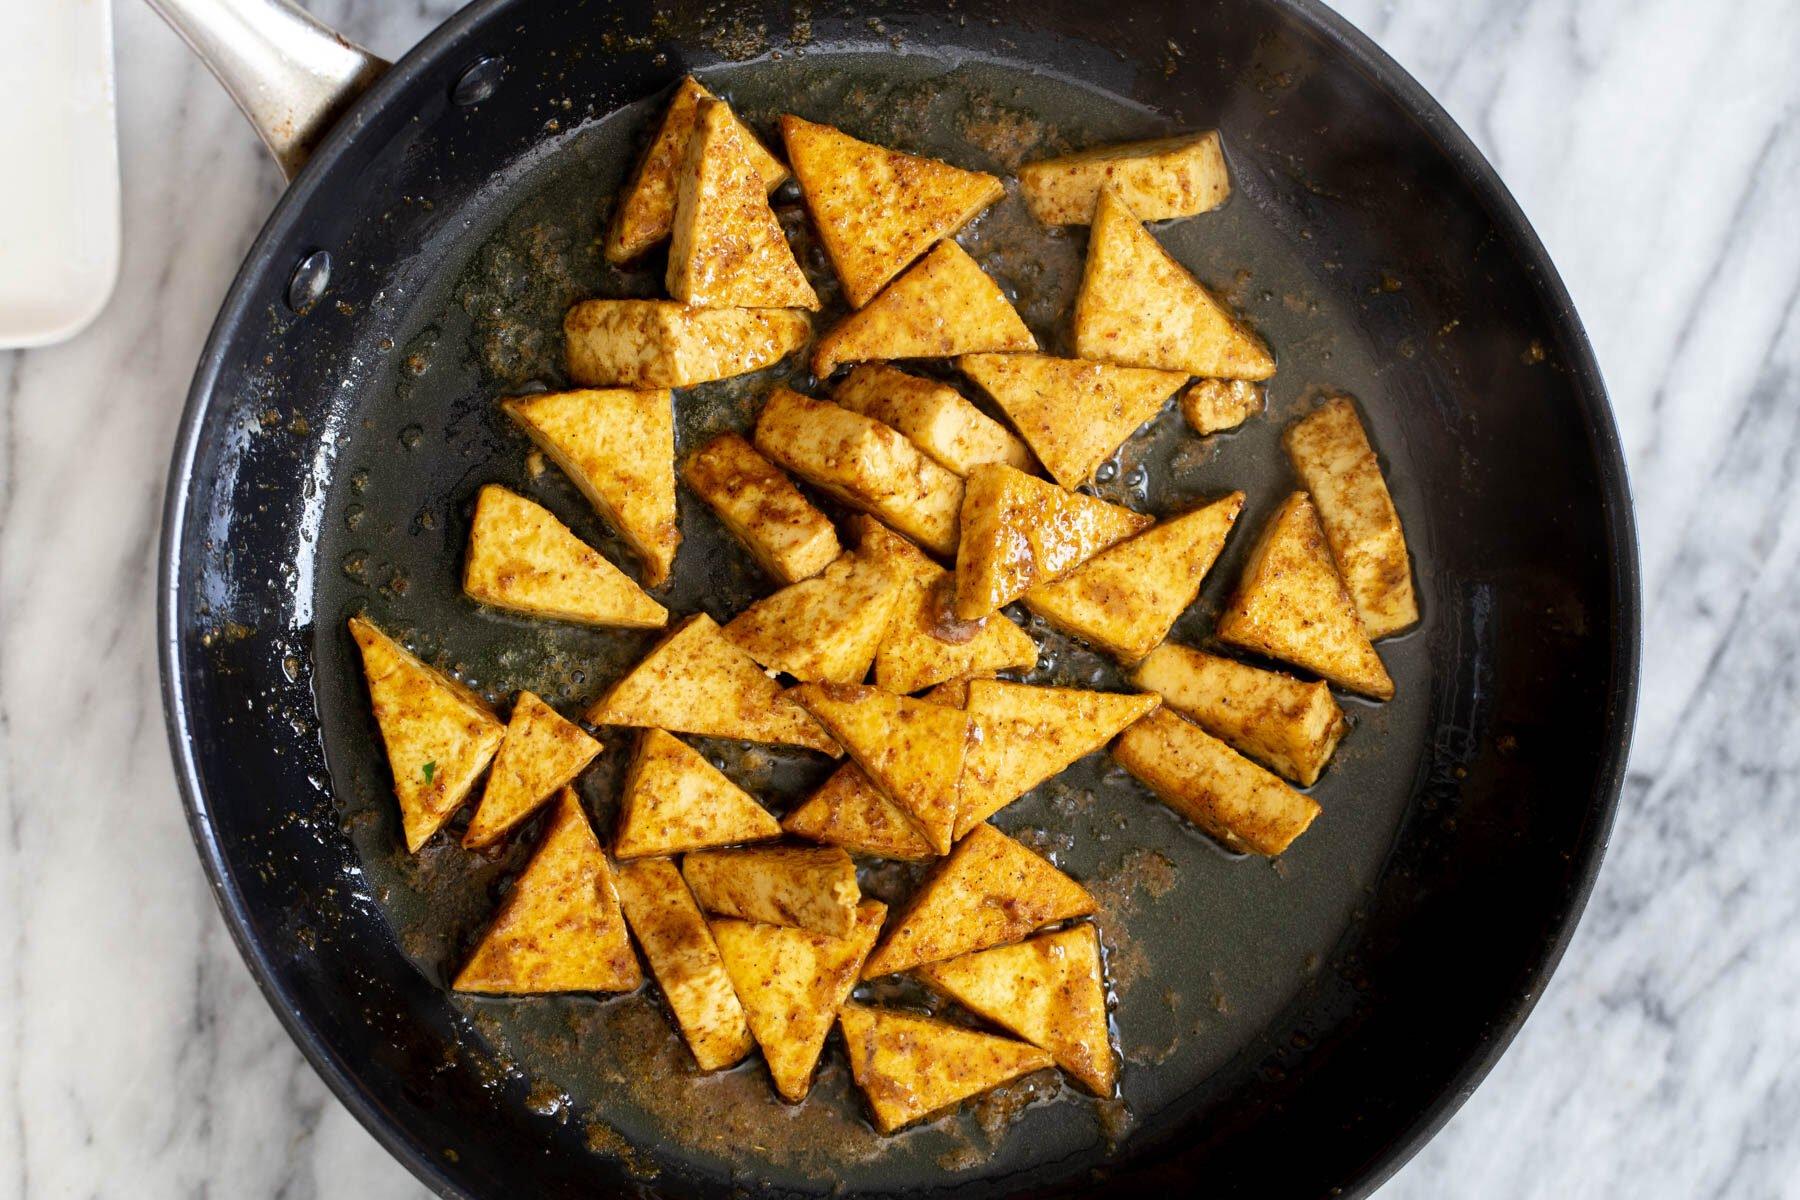 pan-fried curried tofu in a black skillet